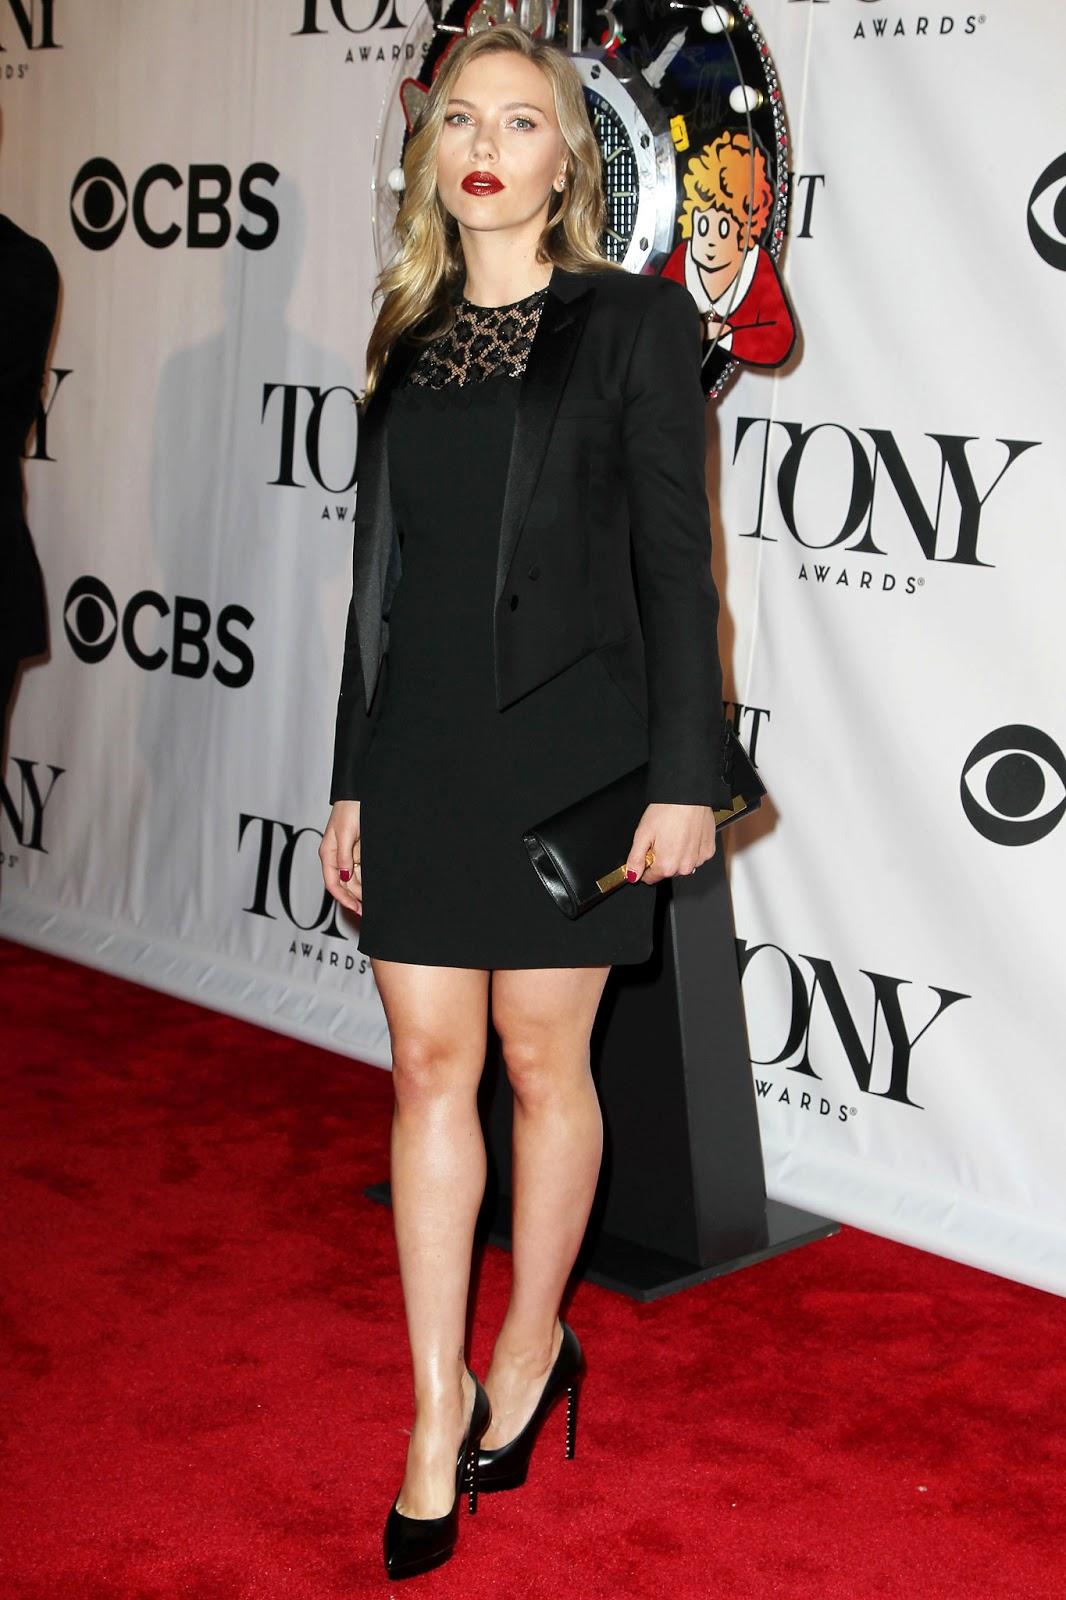 http://3.bp.blogspot.com/-018b7OztHT0/UbaClGyZ4QI/AAAAAAAAgm4/O9L3yLq8uK8/s1600/Scarlett+Johansson+at+The+67th+Annual+Tony+Awards+Red+Carpet+-+June+9,+2013+-08.jpg